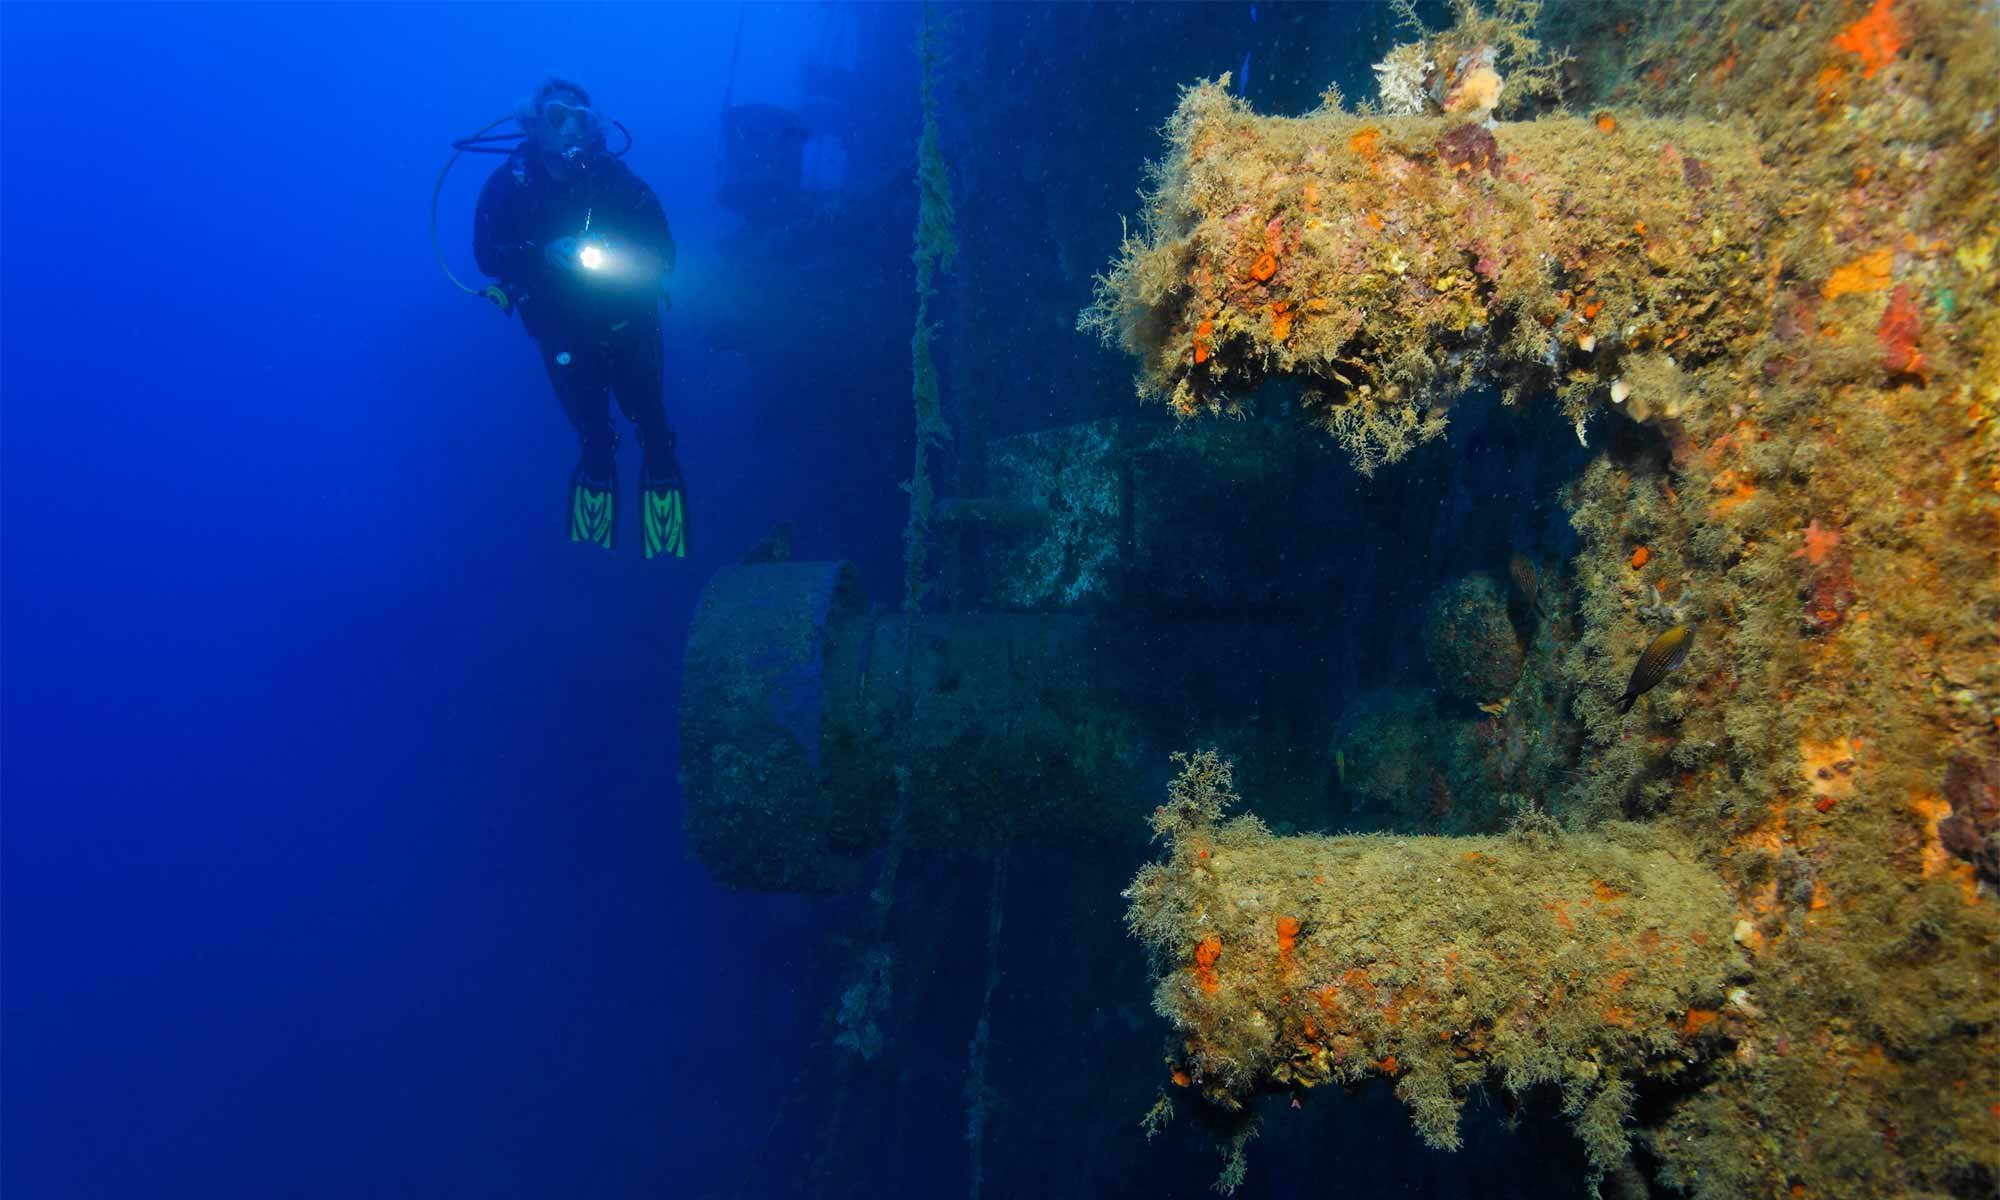 Slow Dive Angebote Griechenland Zakynthos Unterwasser Wrack Bugbauaufbauten